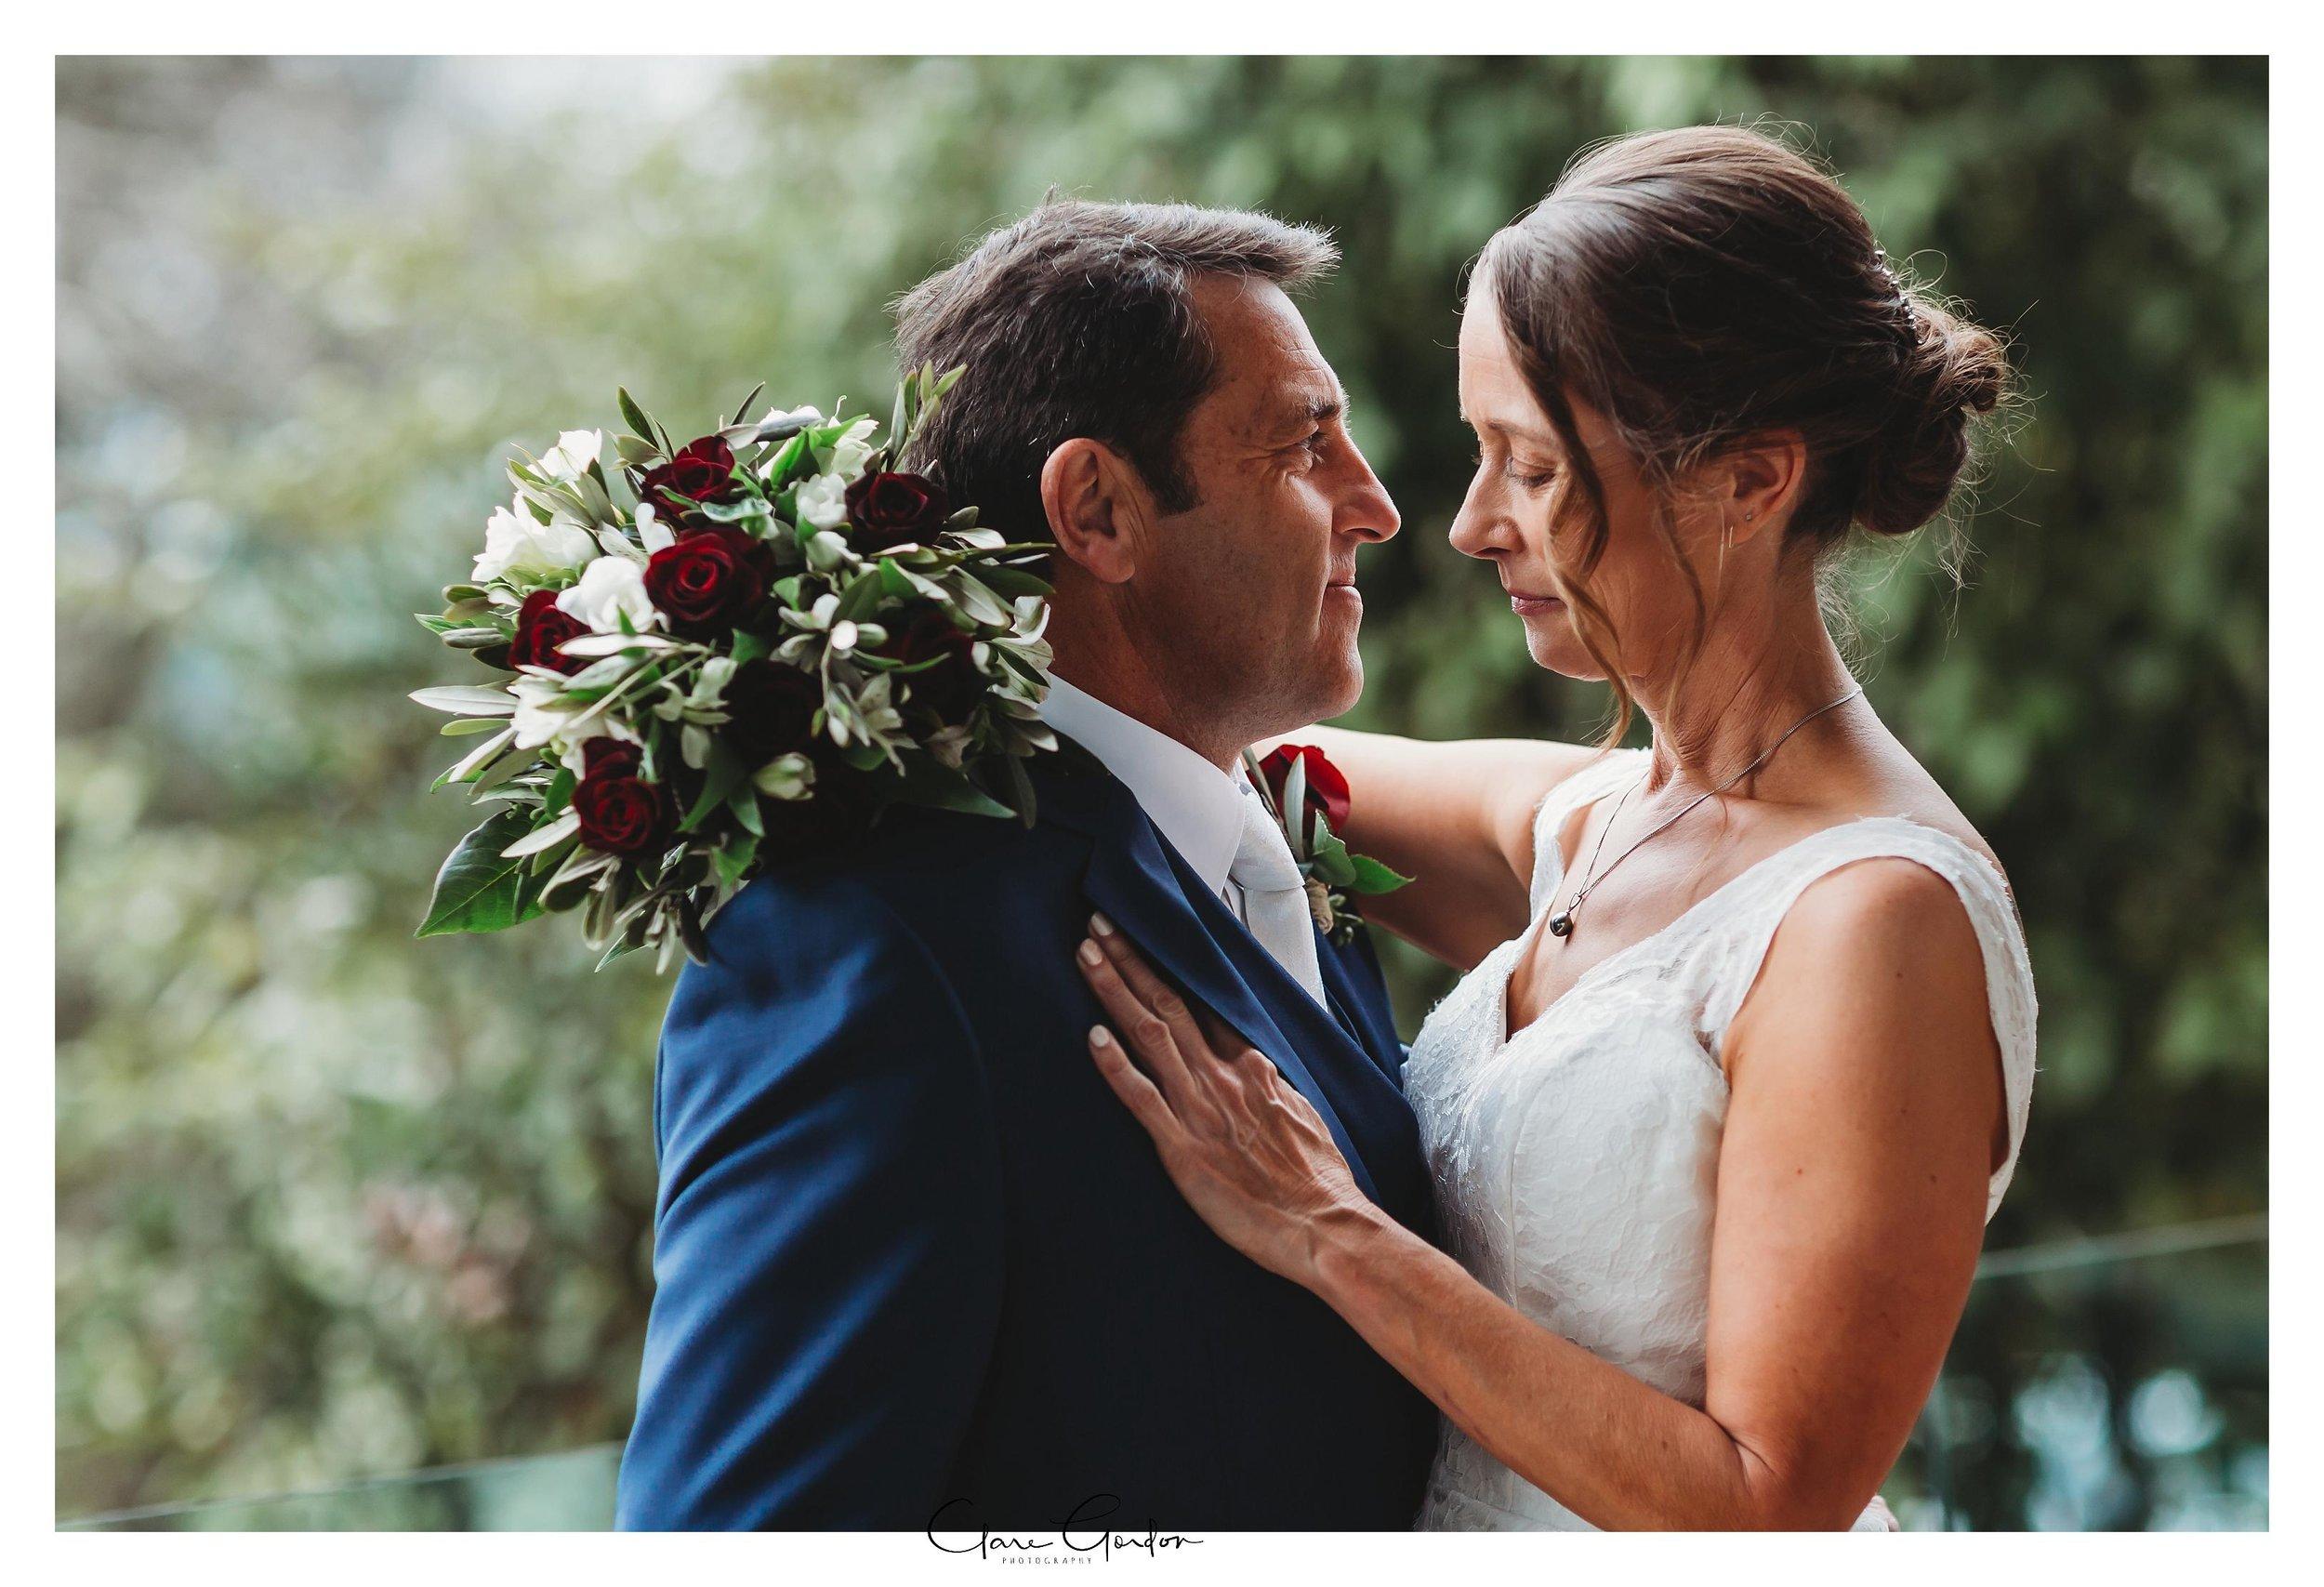 Hamilton-NZ-wedding-photographer-Bride-reflection-Waikato-wedding-photographer-Novotel-Hamilton-Clare-Gordon-photography (24).jpg